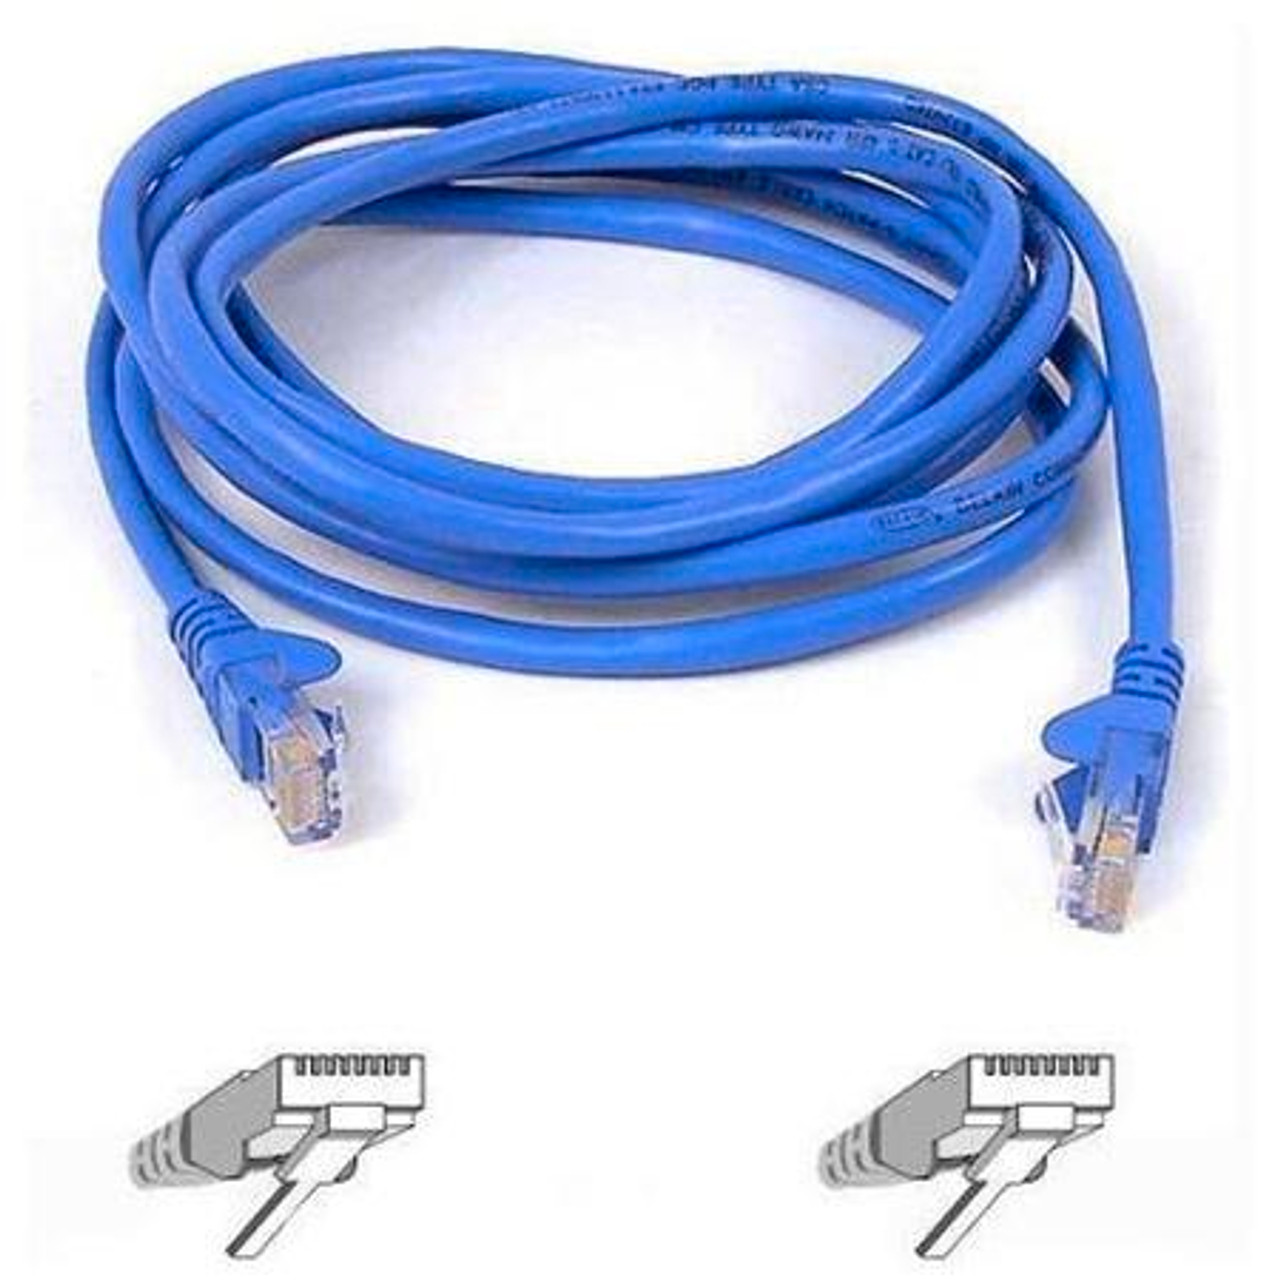 Belkin Patch CAT 5e  RJ-45 Cable Blue Patch Cable 15ft